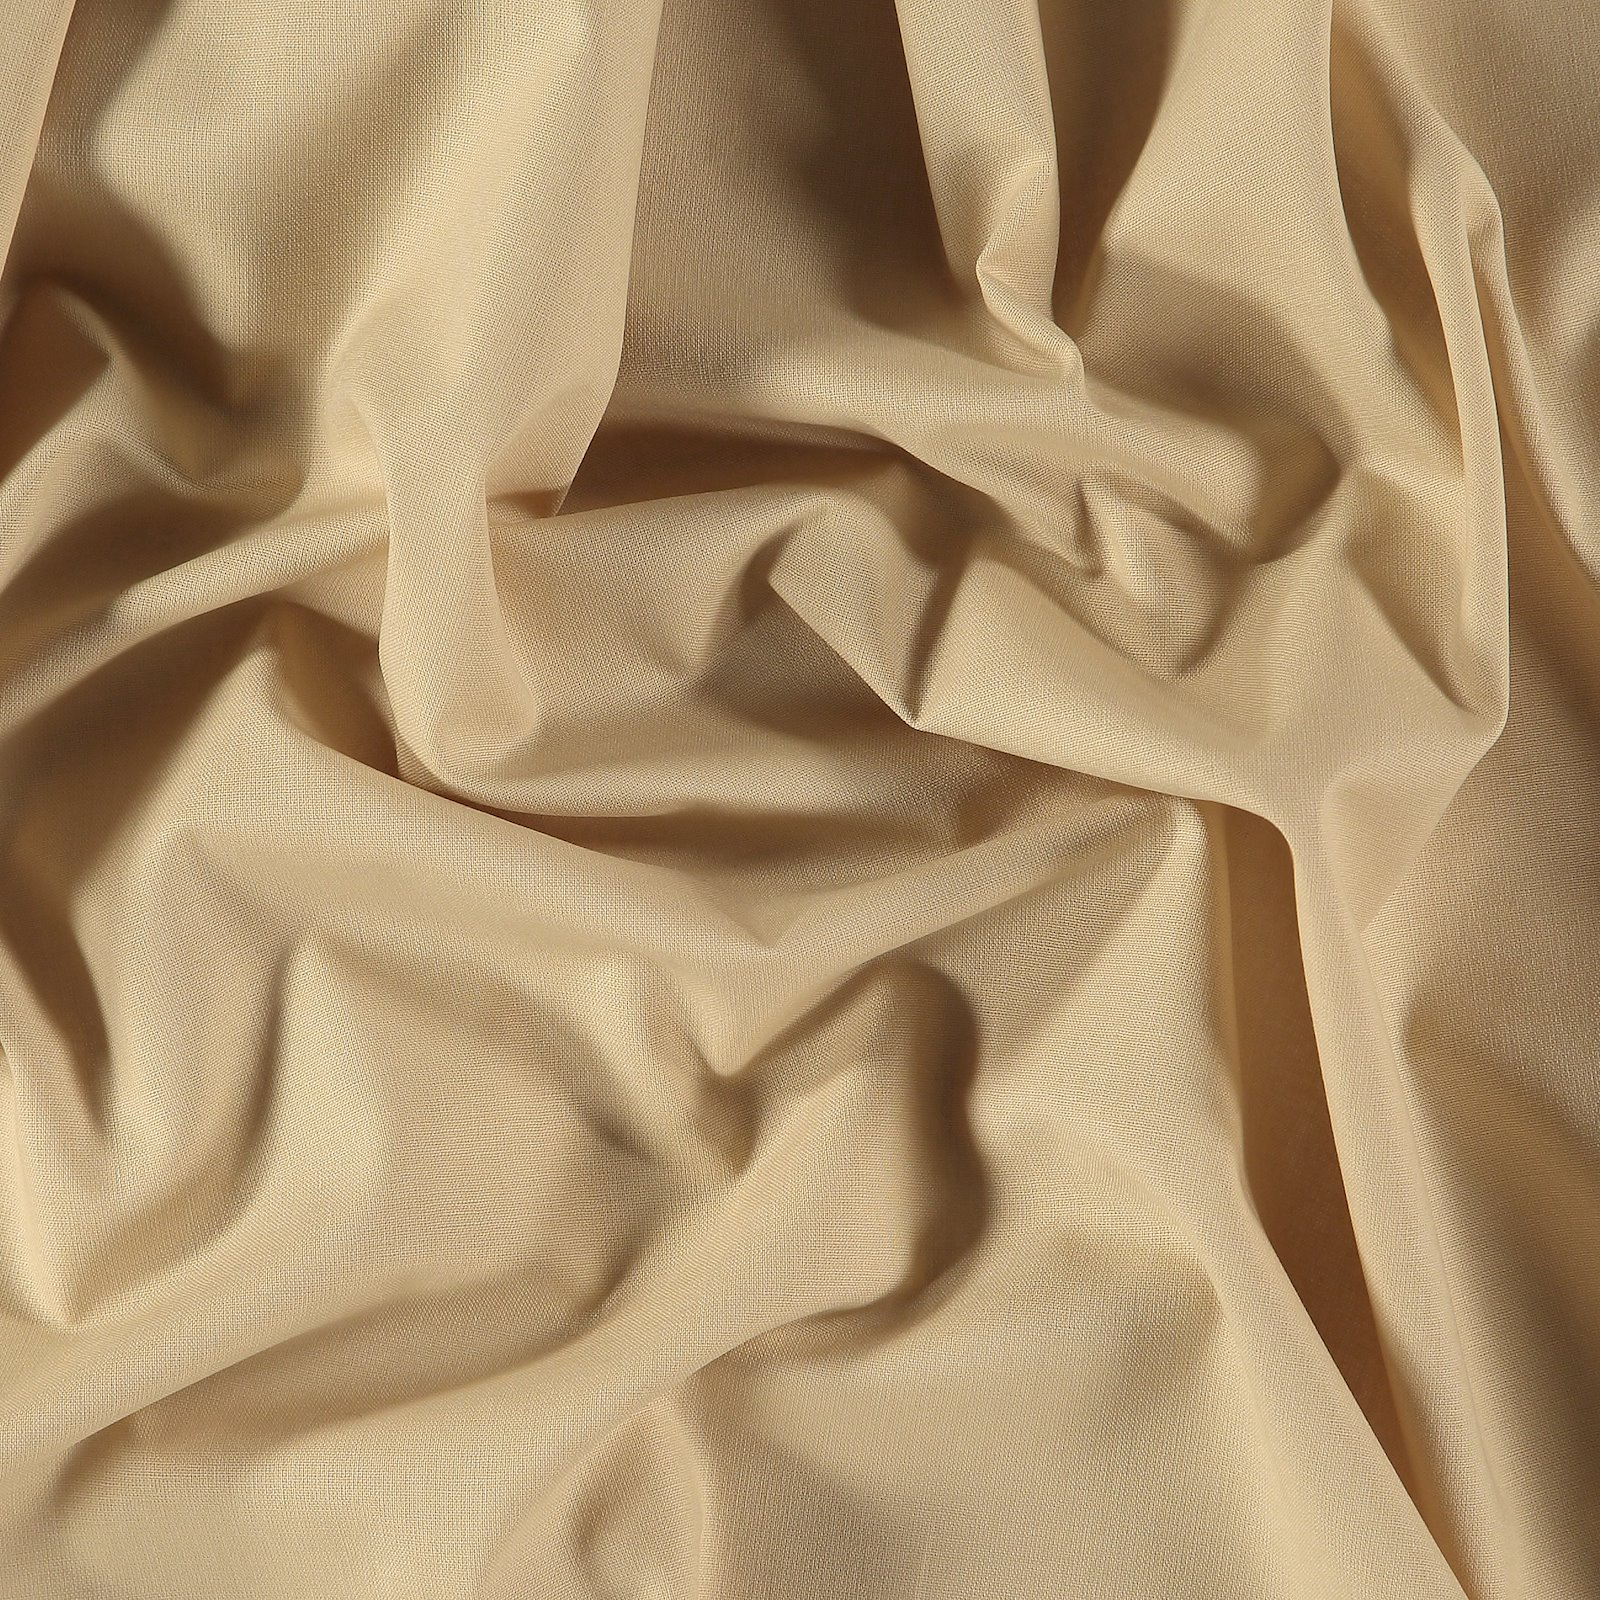 Organic cotton light beige 780507_pack